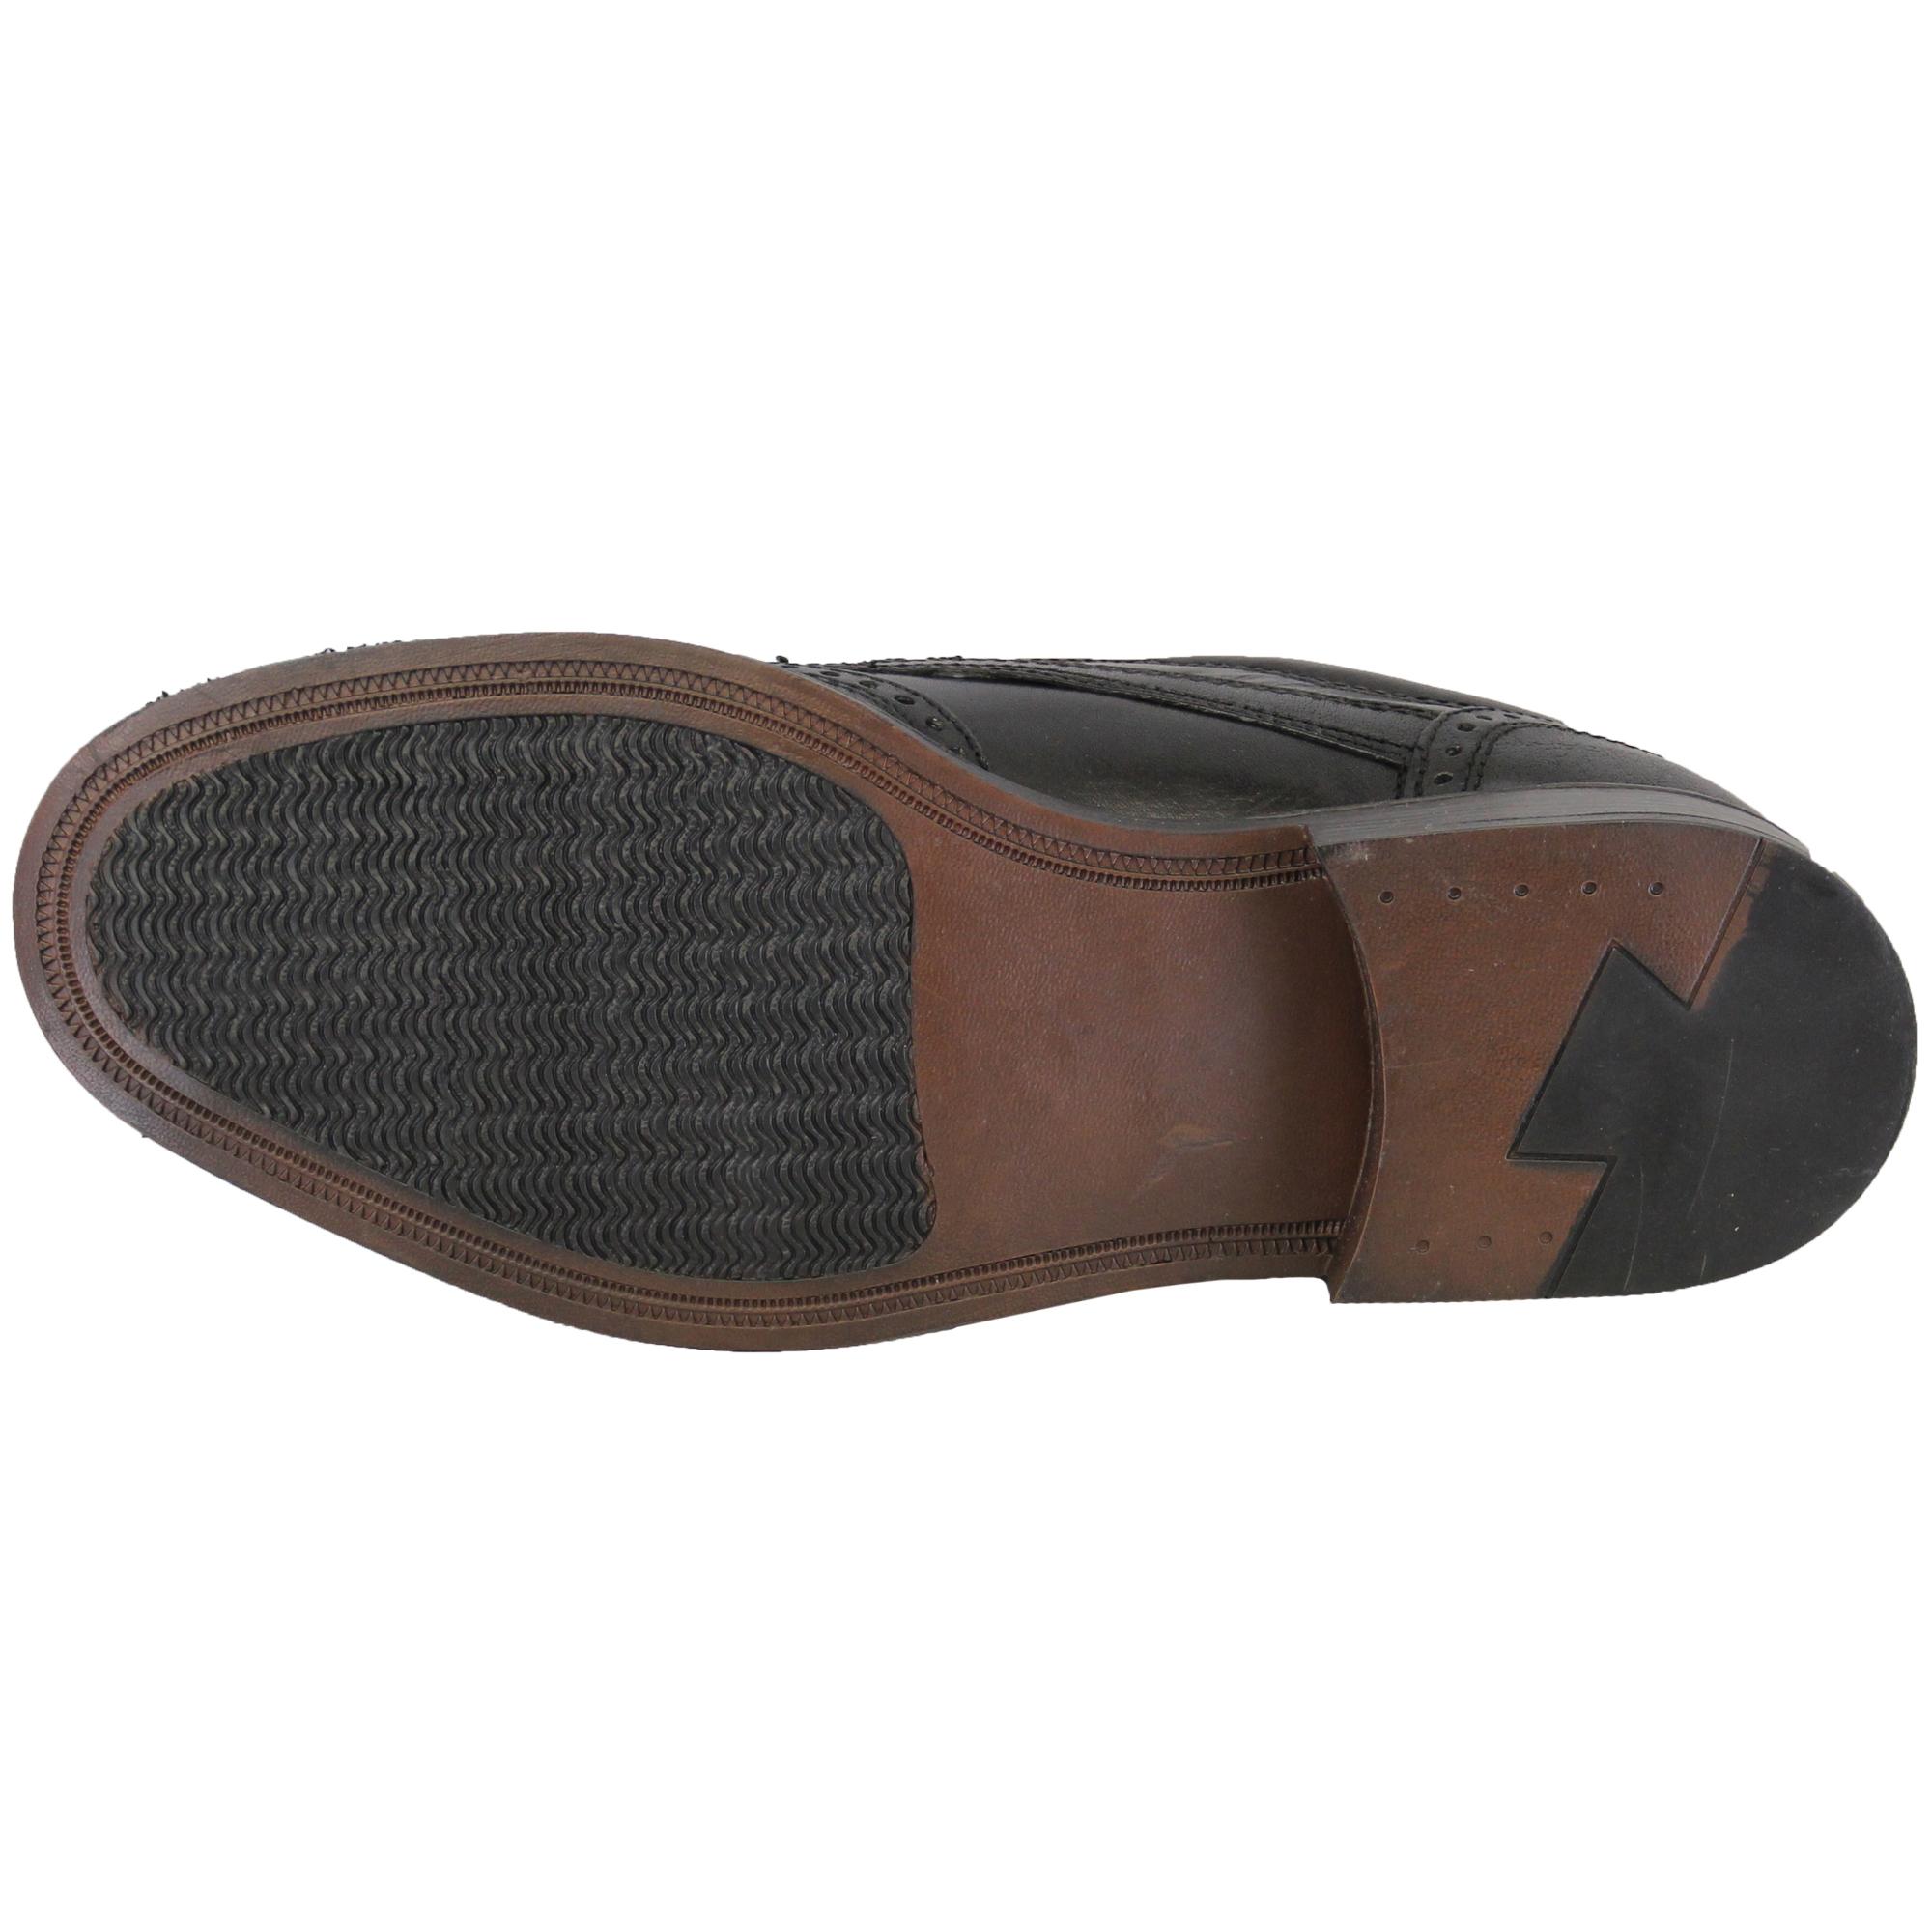 Oaktrak Mens Work Shoes